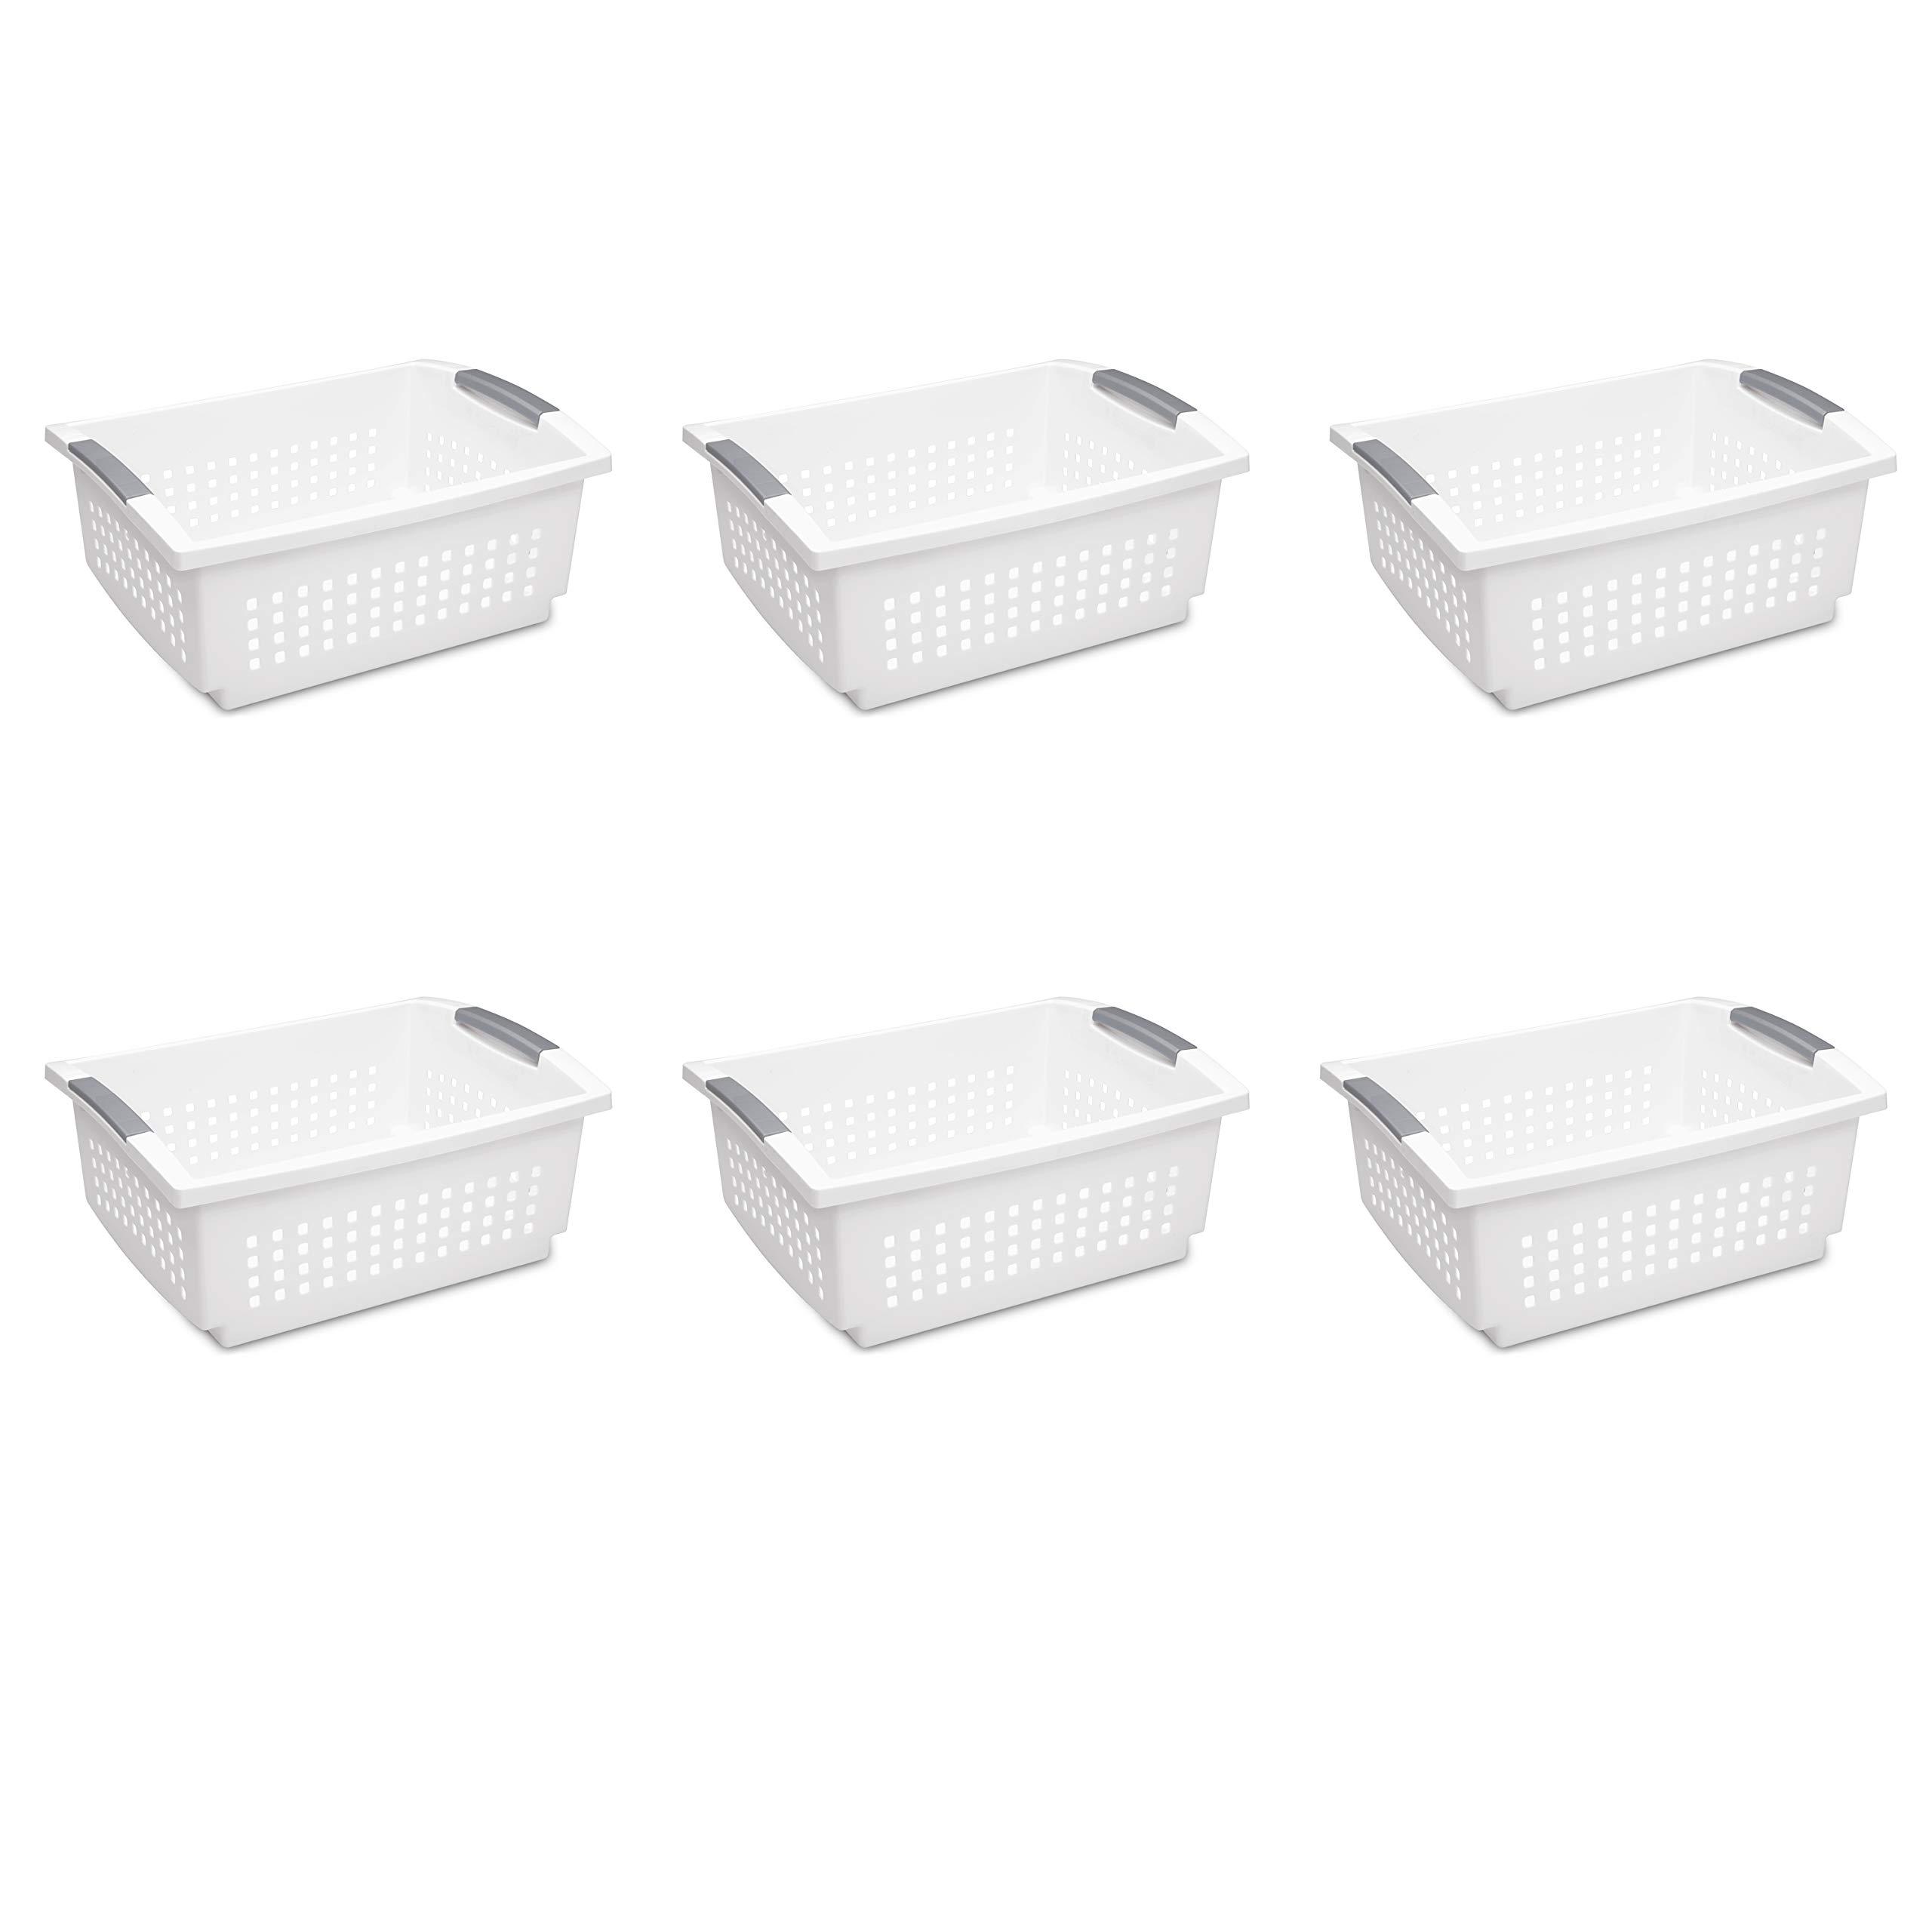 Sterilite 16648006 Large Stacking Basket, White Basket w/ Titanium Accents, 6-Pack by STERILITE